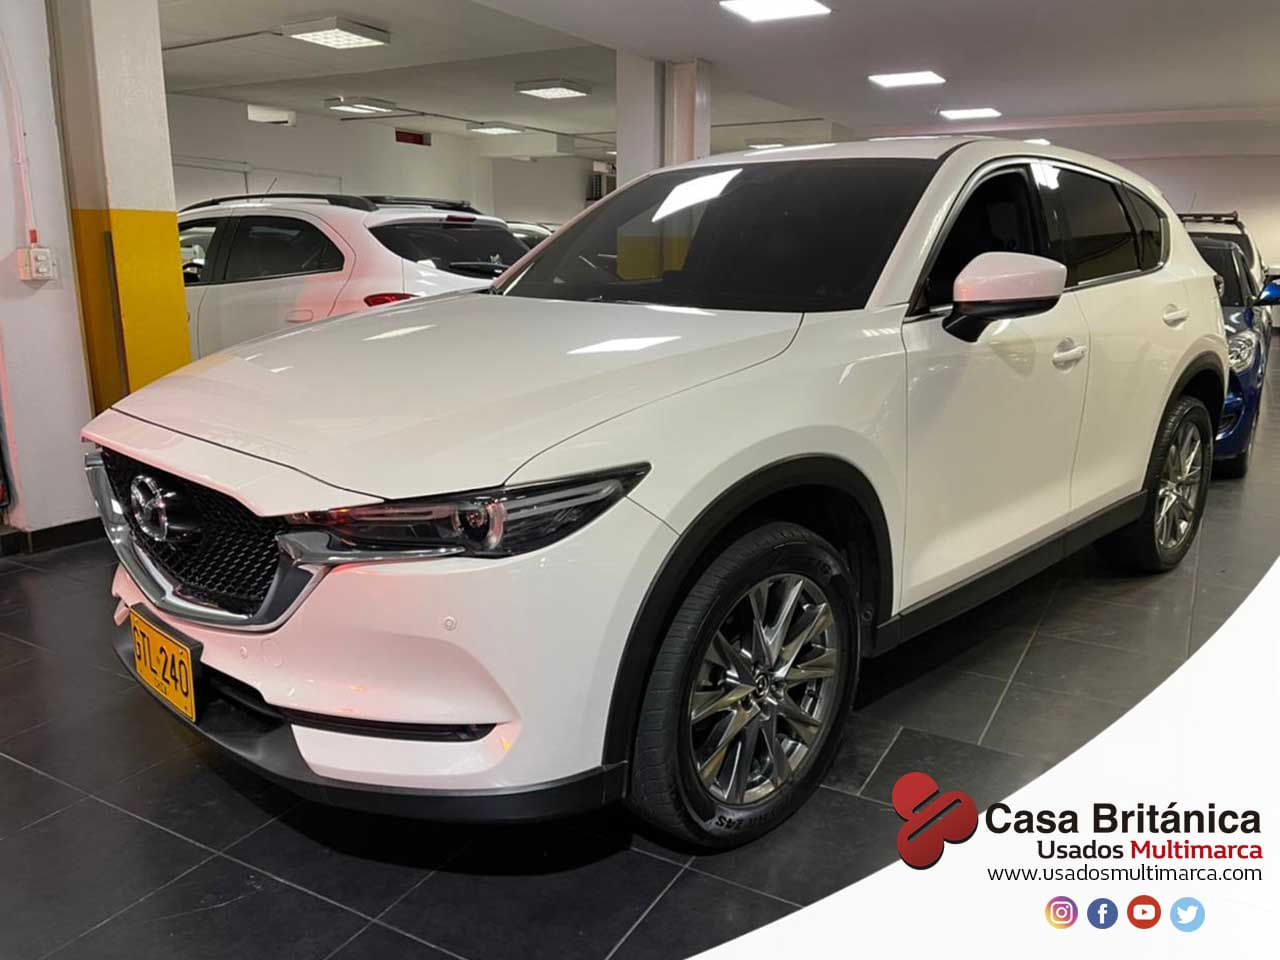 Mazda-cx5-Signature-01450401-1